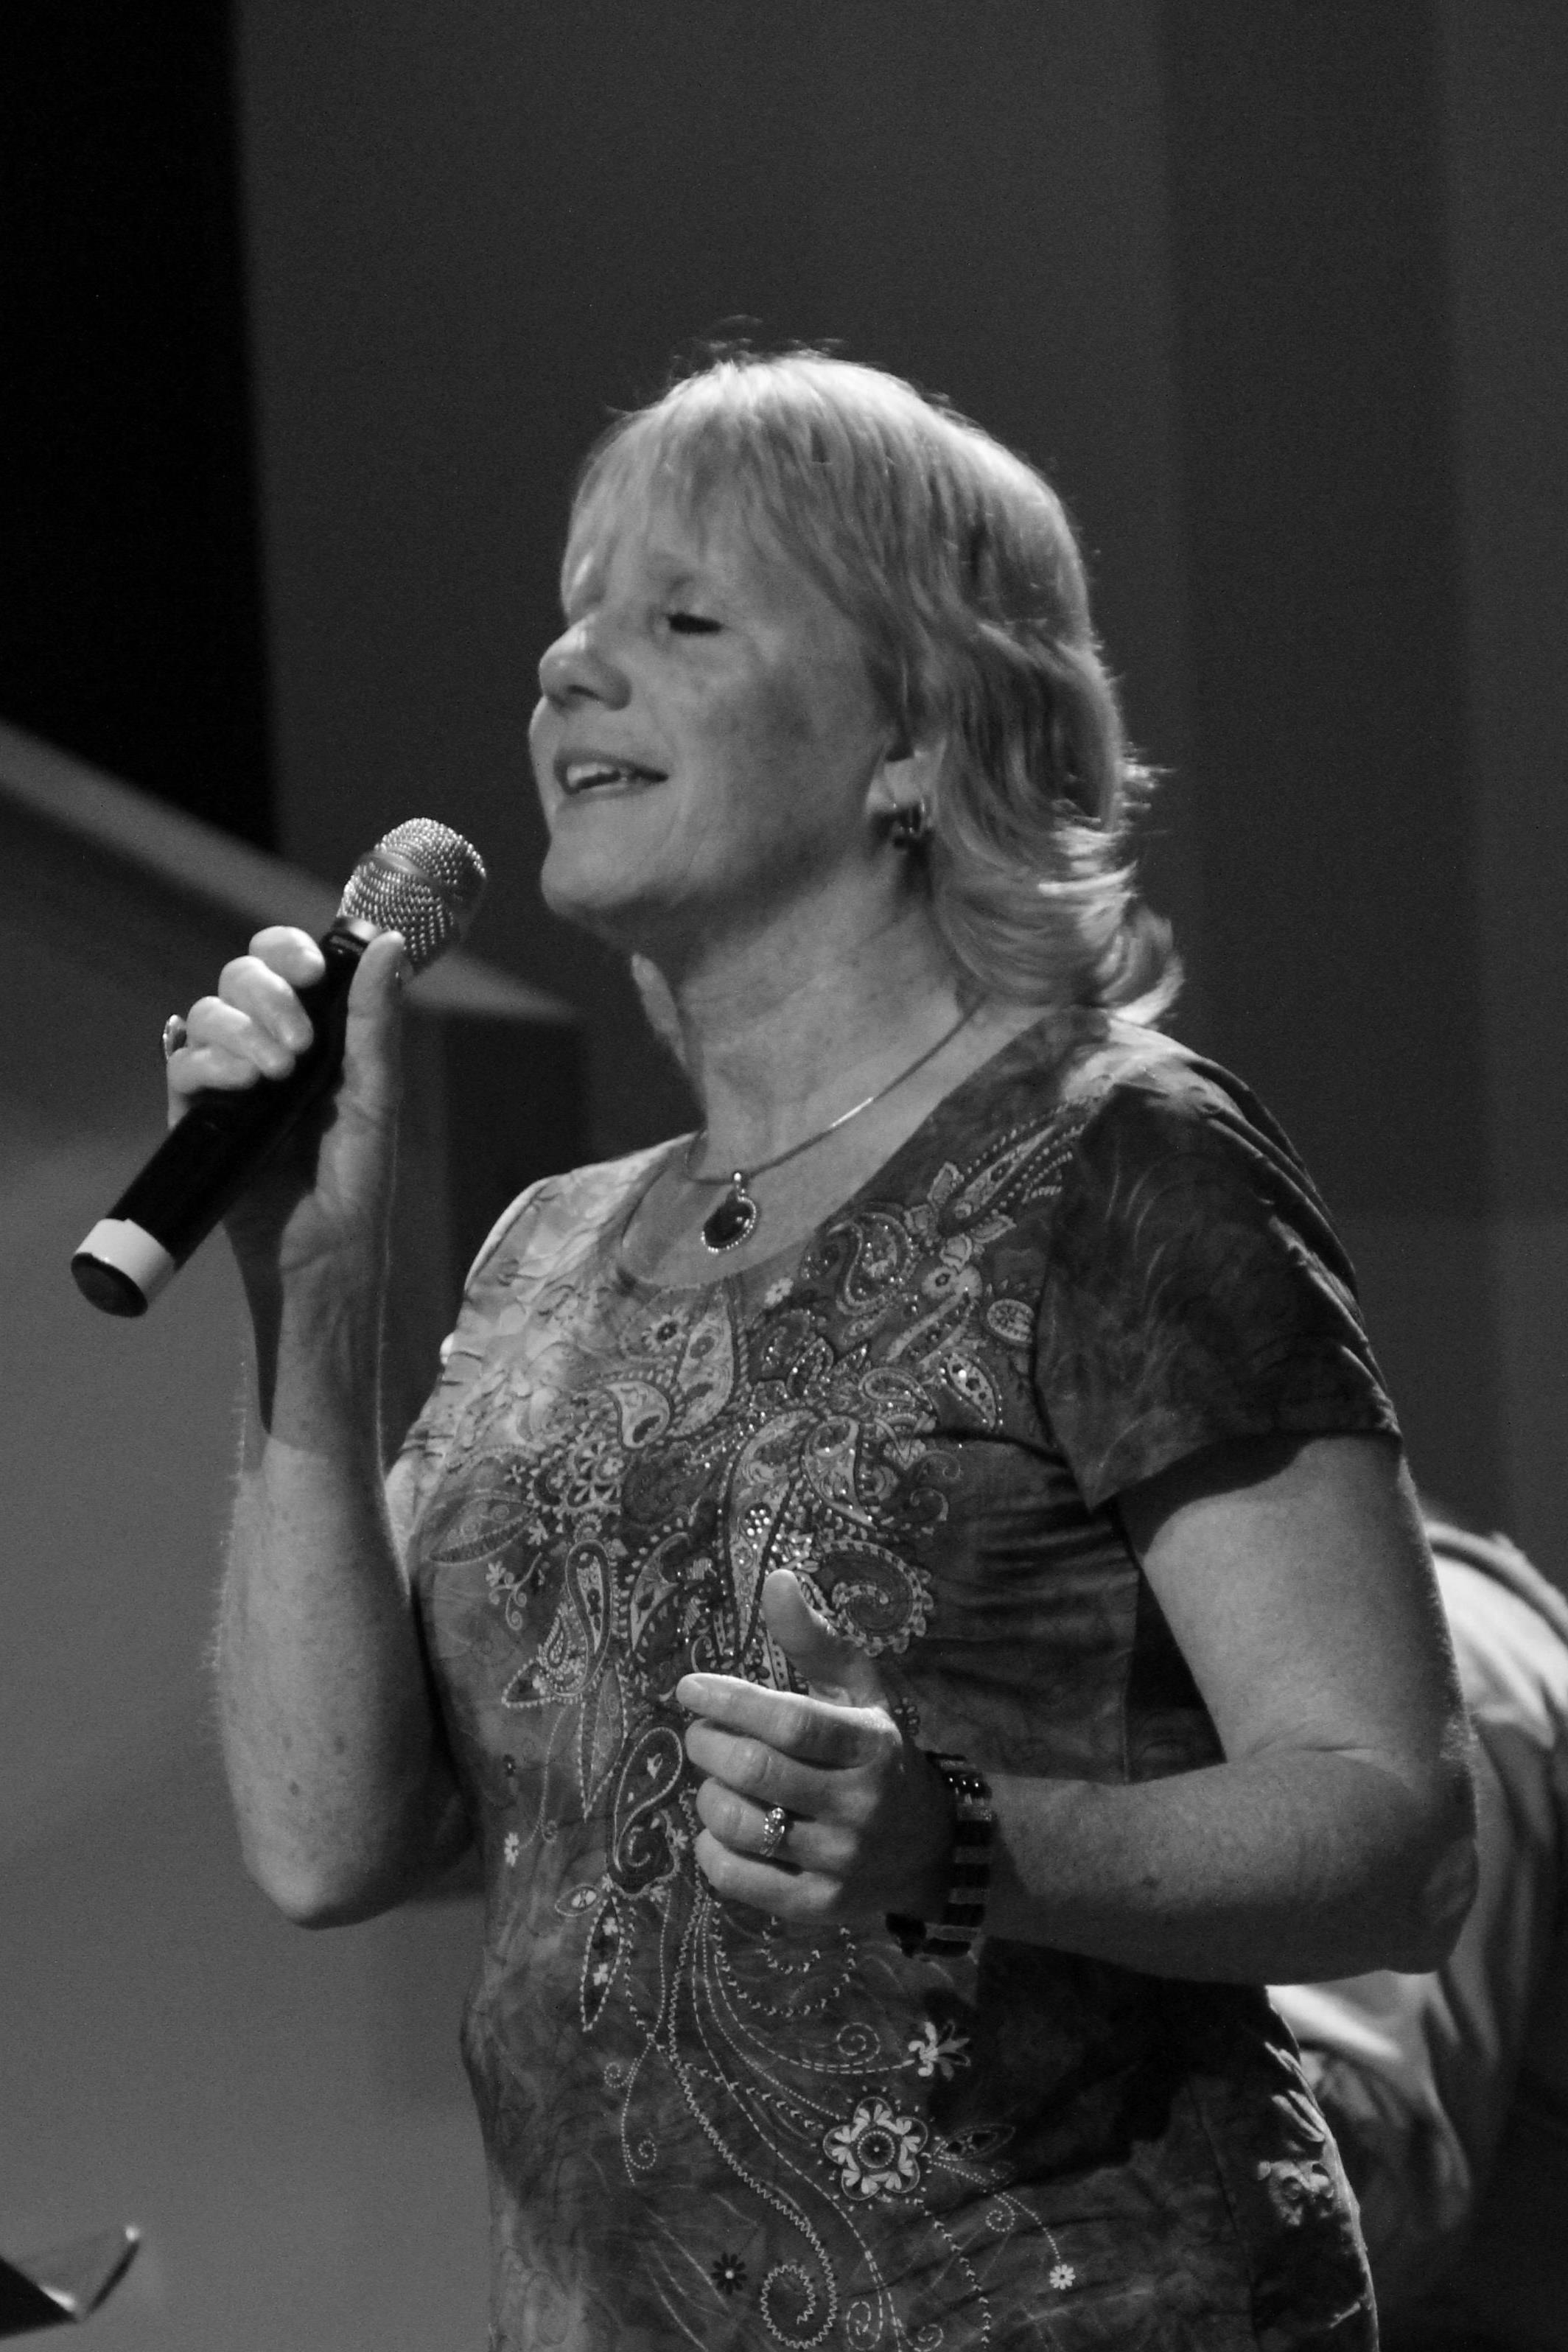 Pam Meinka; Worship Vocal